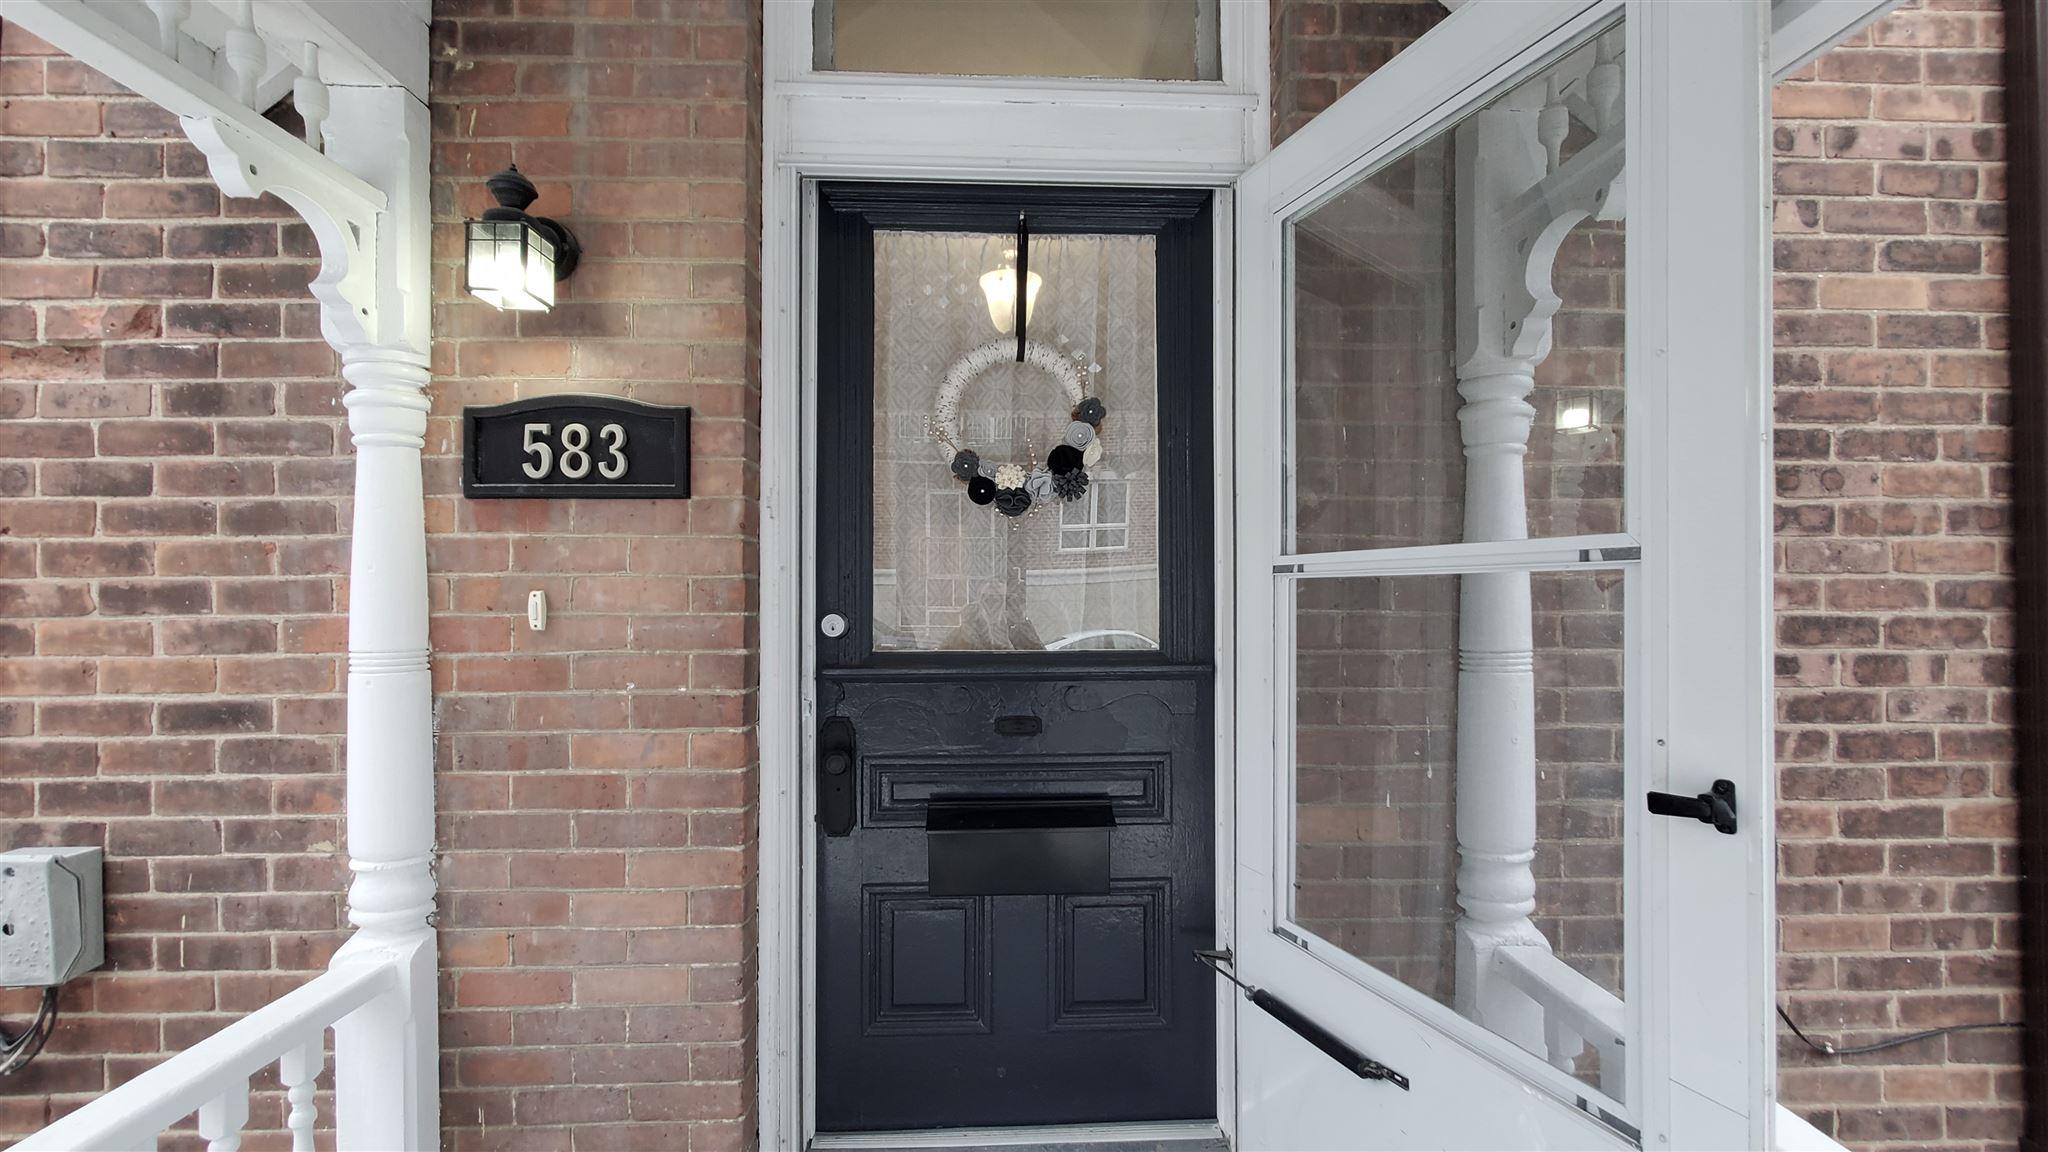 583 Victoria Street, Kingston Ontario, Canada